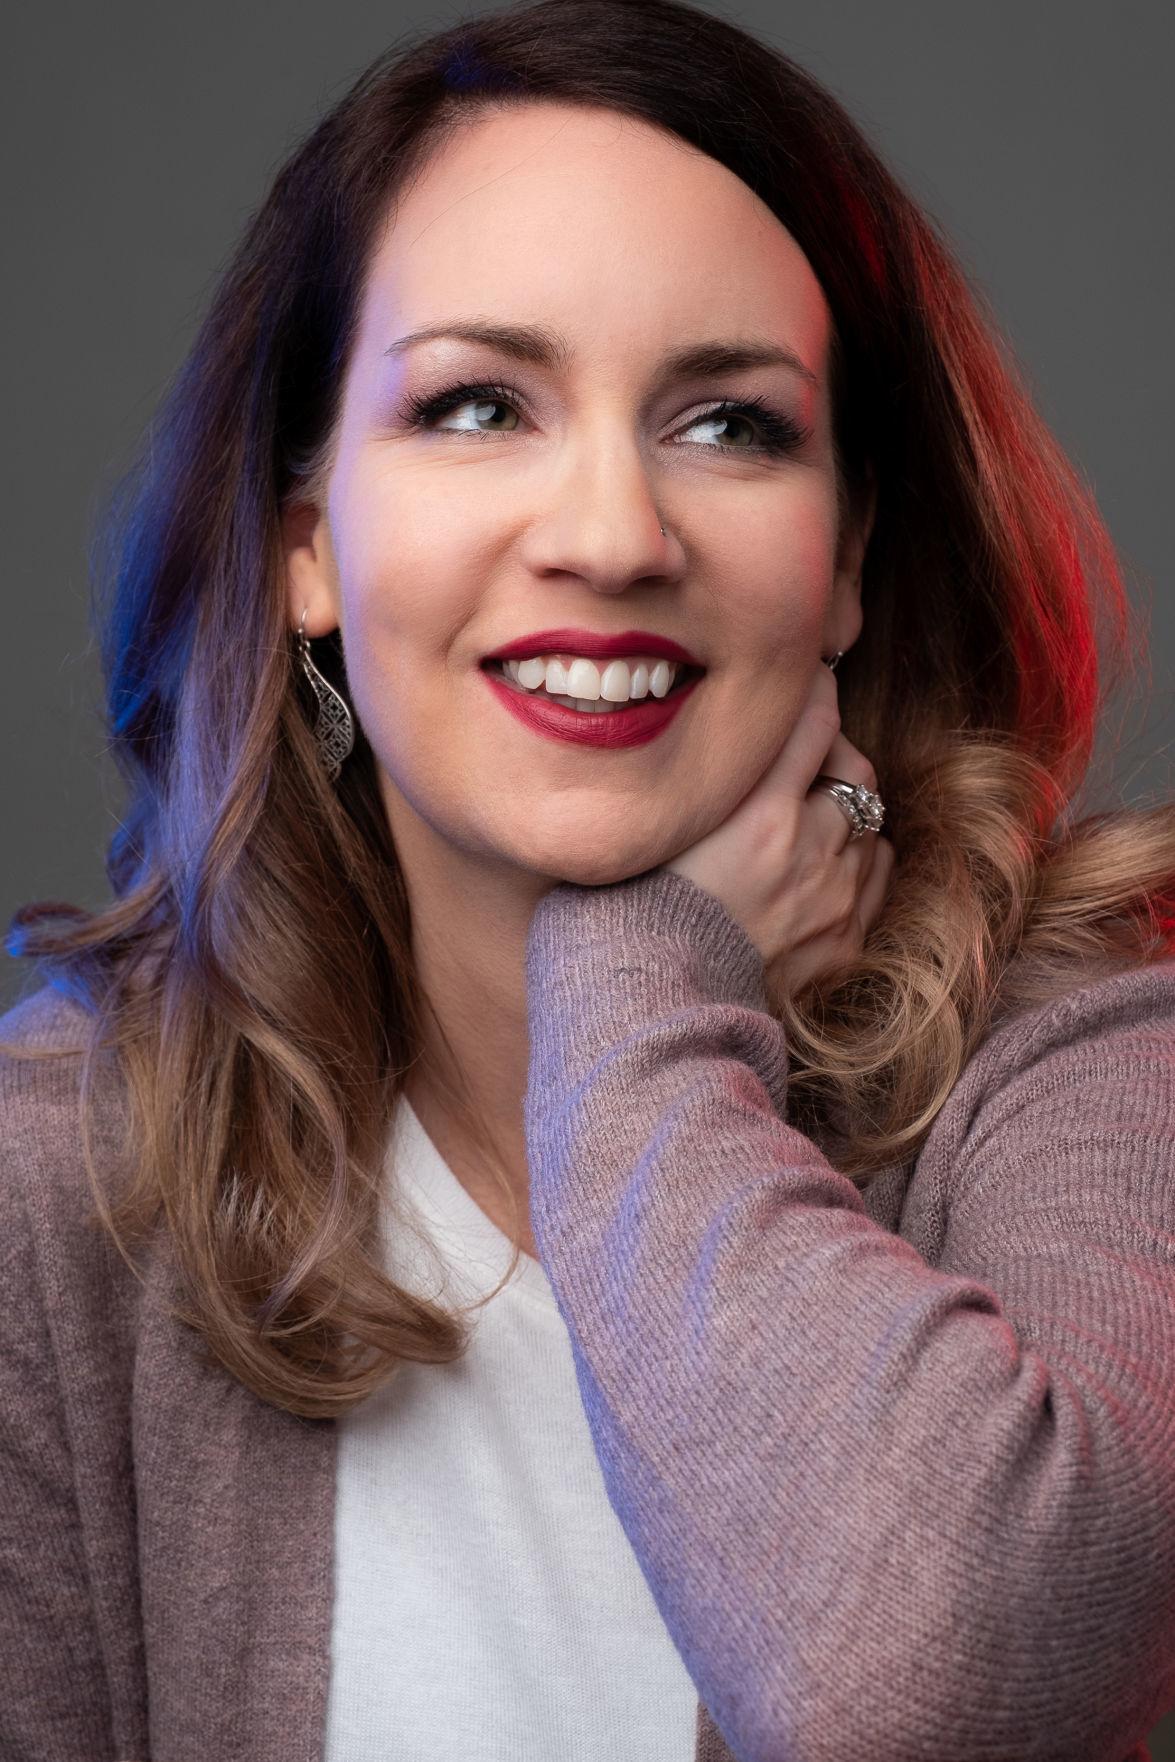 Minnesota author Megan Peterson